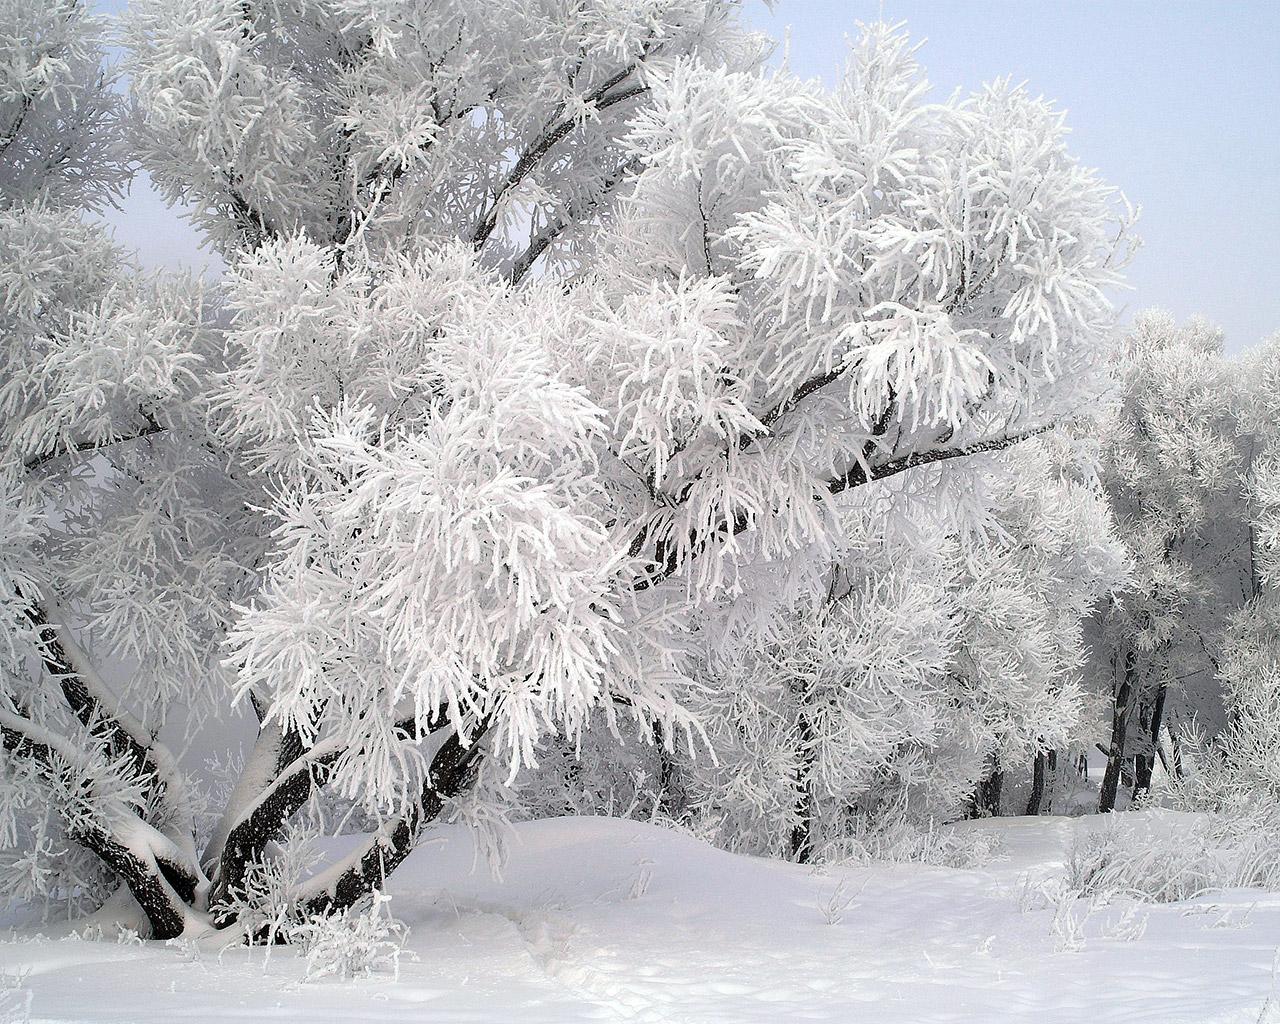 Wallpaper ไหนว่าปีนี้จะหนาวสุดในรอบ 30 ปี 50 Pic 172104-foxixol